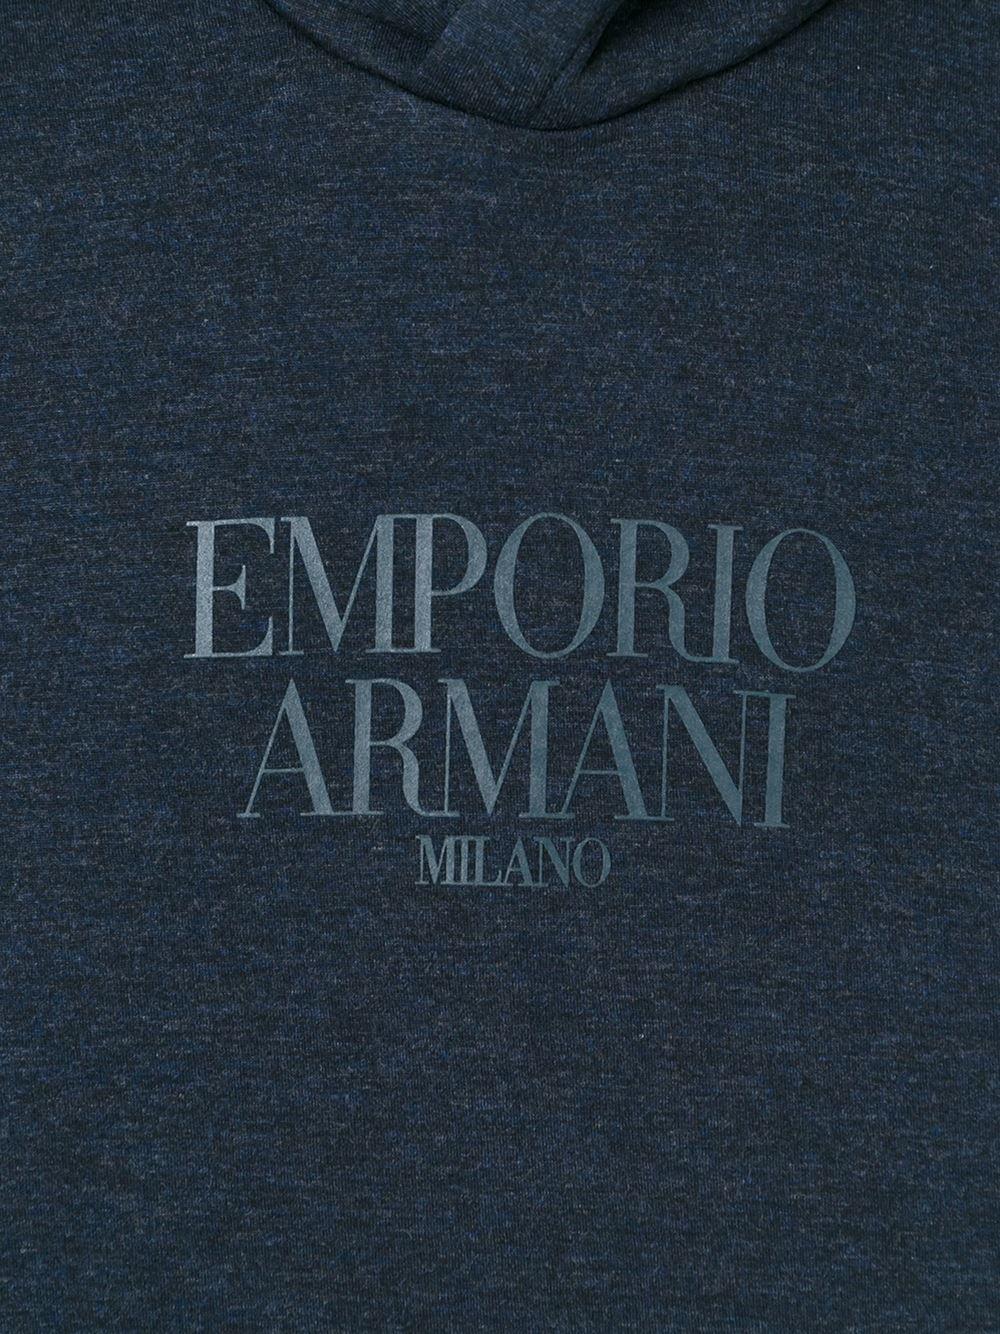 Emporio armani logo hoodie in gray for men grey lyst - Emporio giorgio armani logo ...